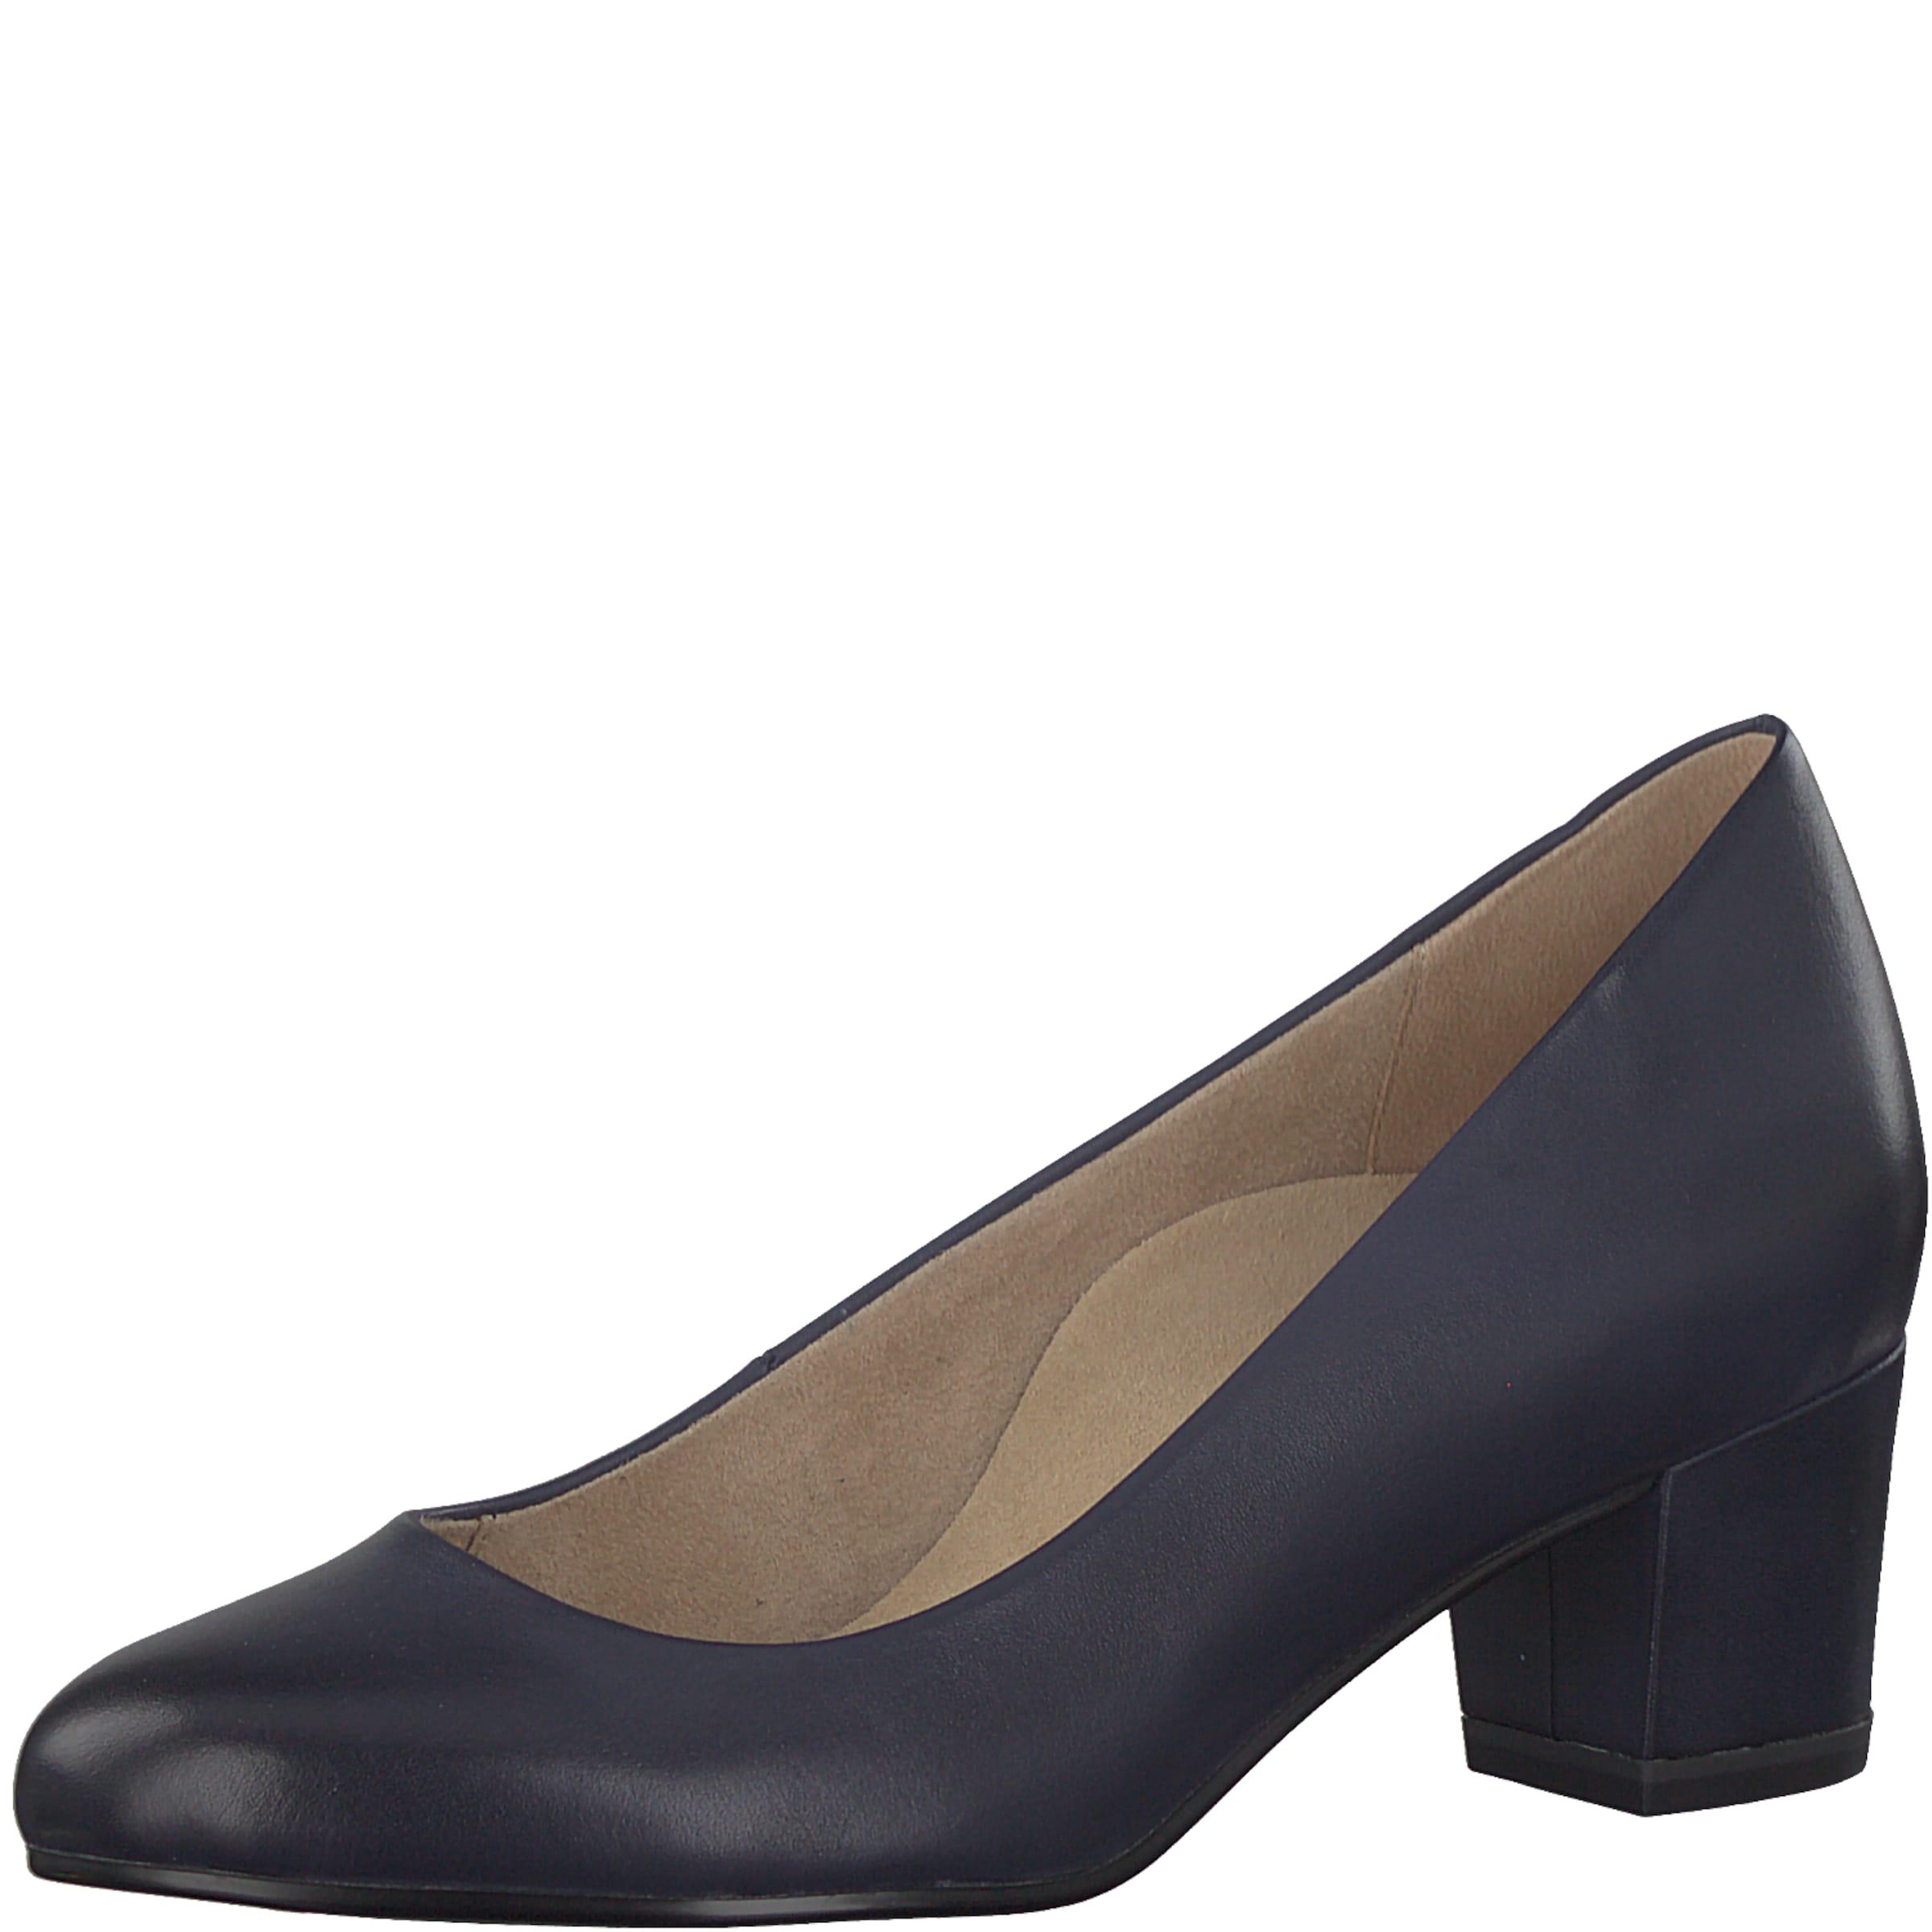 Haltbare Mode billige Schuhe TAMARIS | Pumps Schuhe 'Heart&Sole' Schuhe Gut getragene Schuhe Pumps d07060